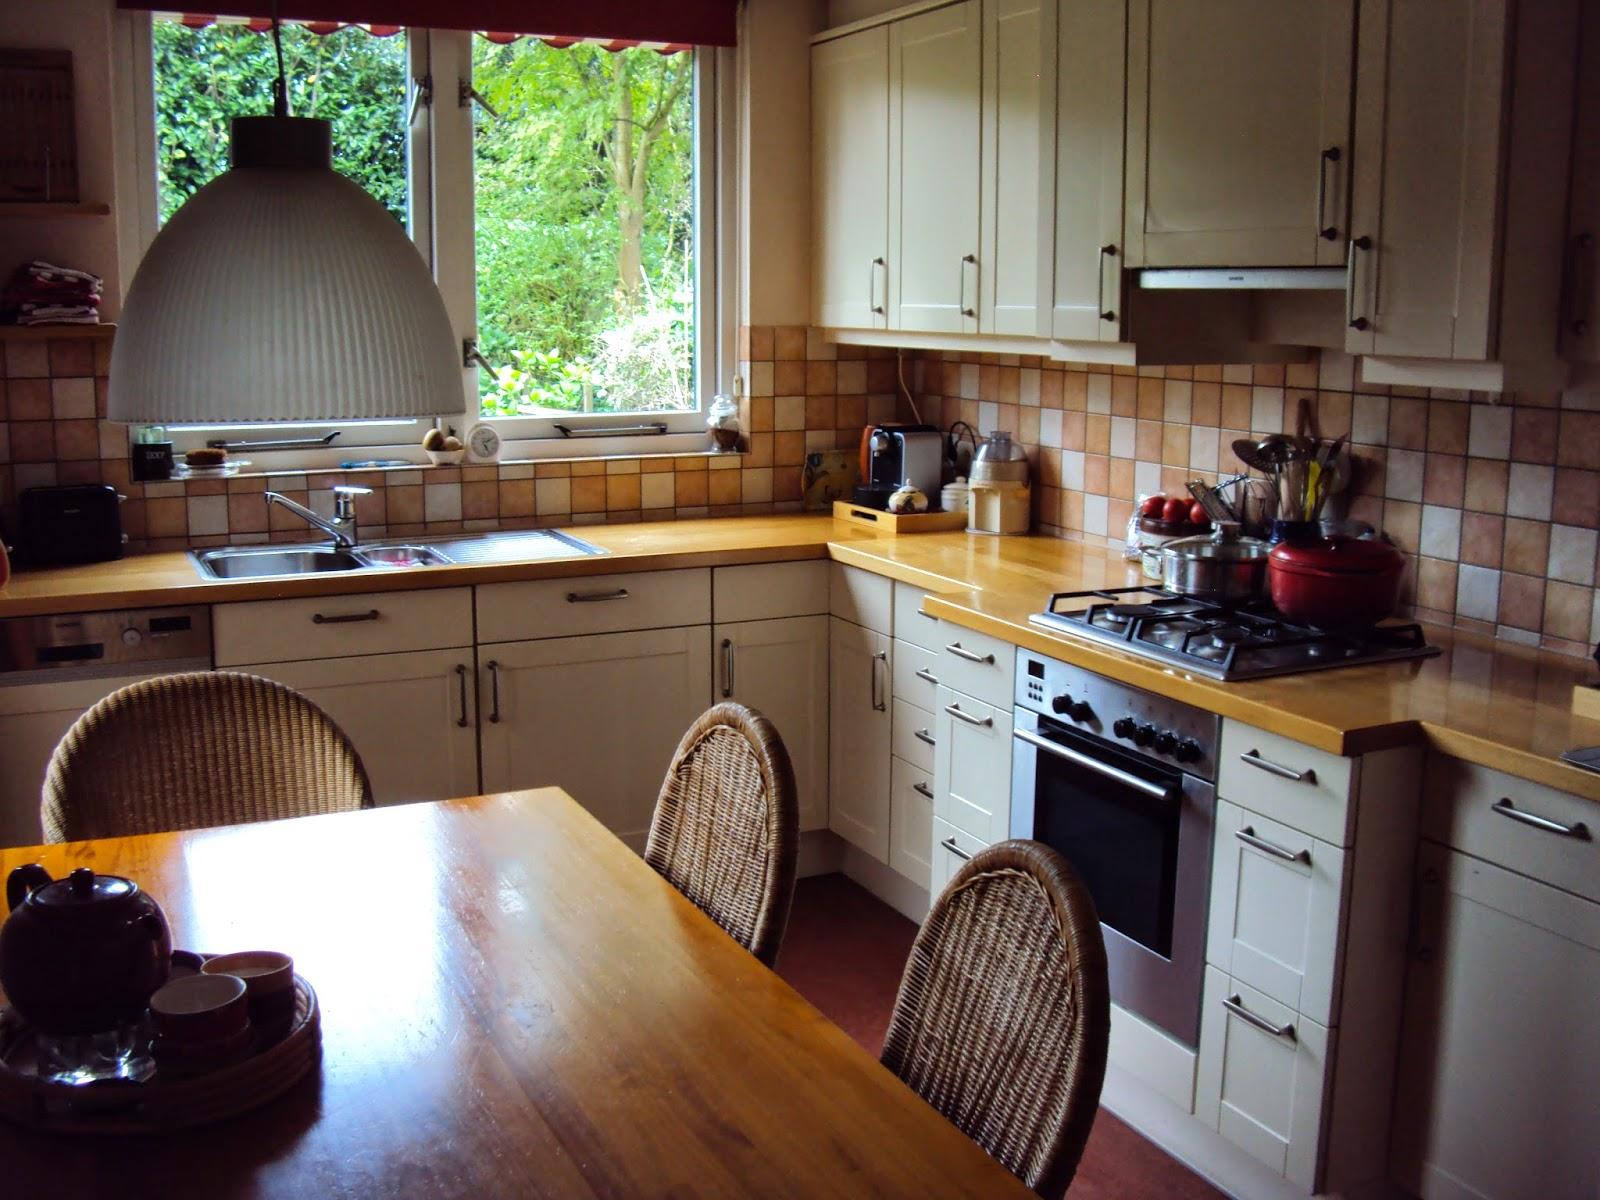 Moesker 39 s moestuin mieren fruitvliegjes en konijnen for Fruitvliegjes in keuken